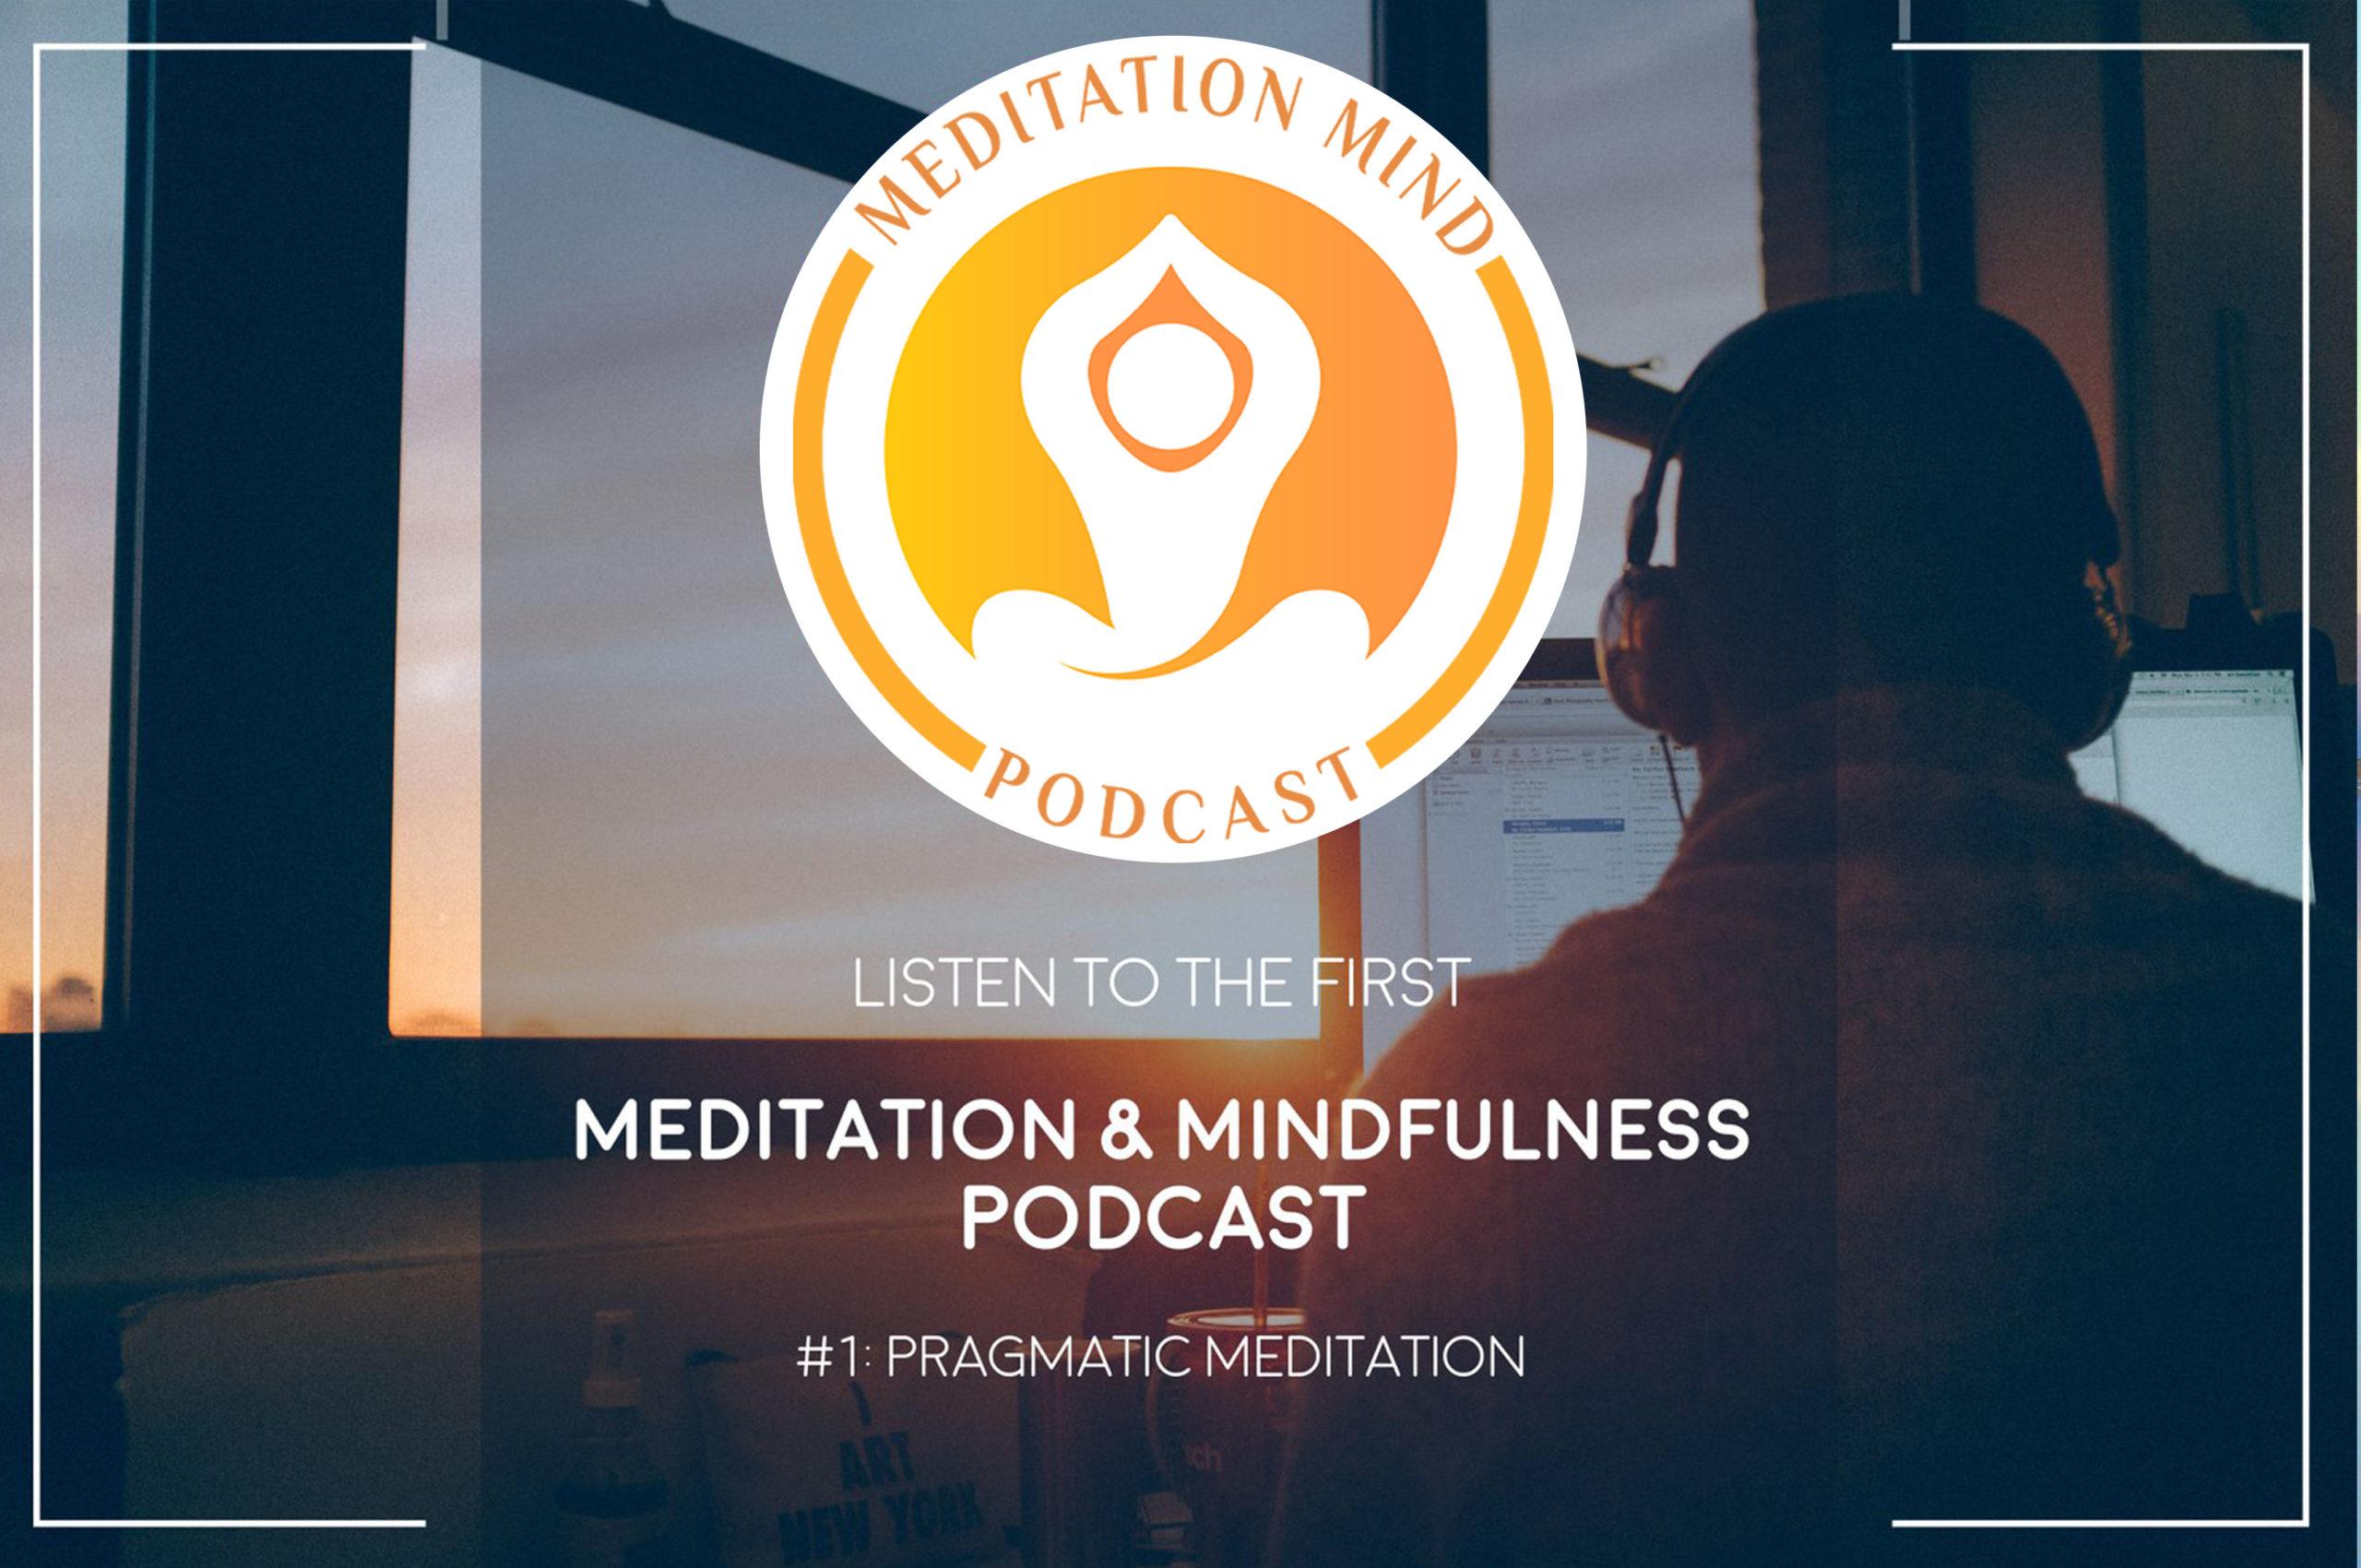 Episode with David Bowman talking about Pragmatic Meditation